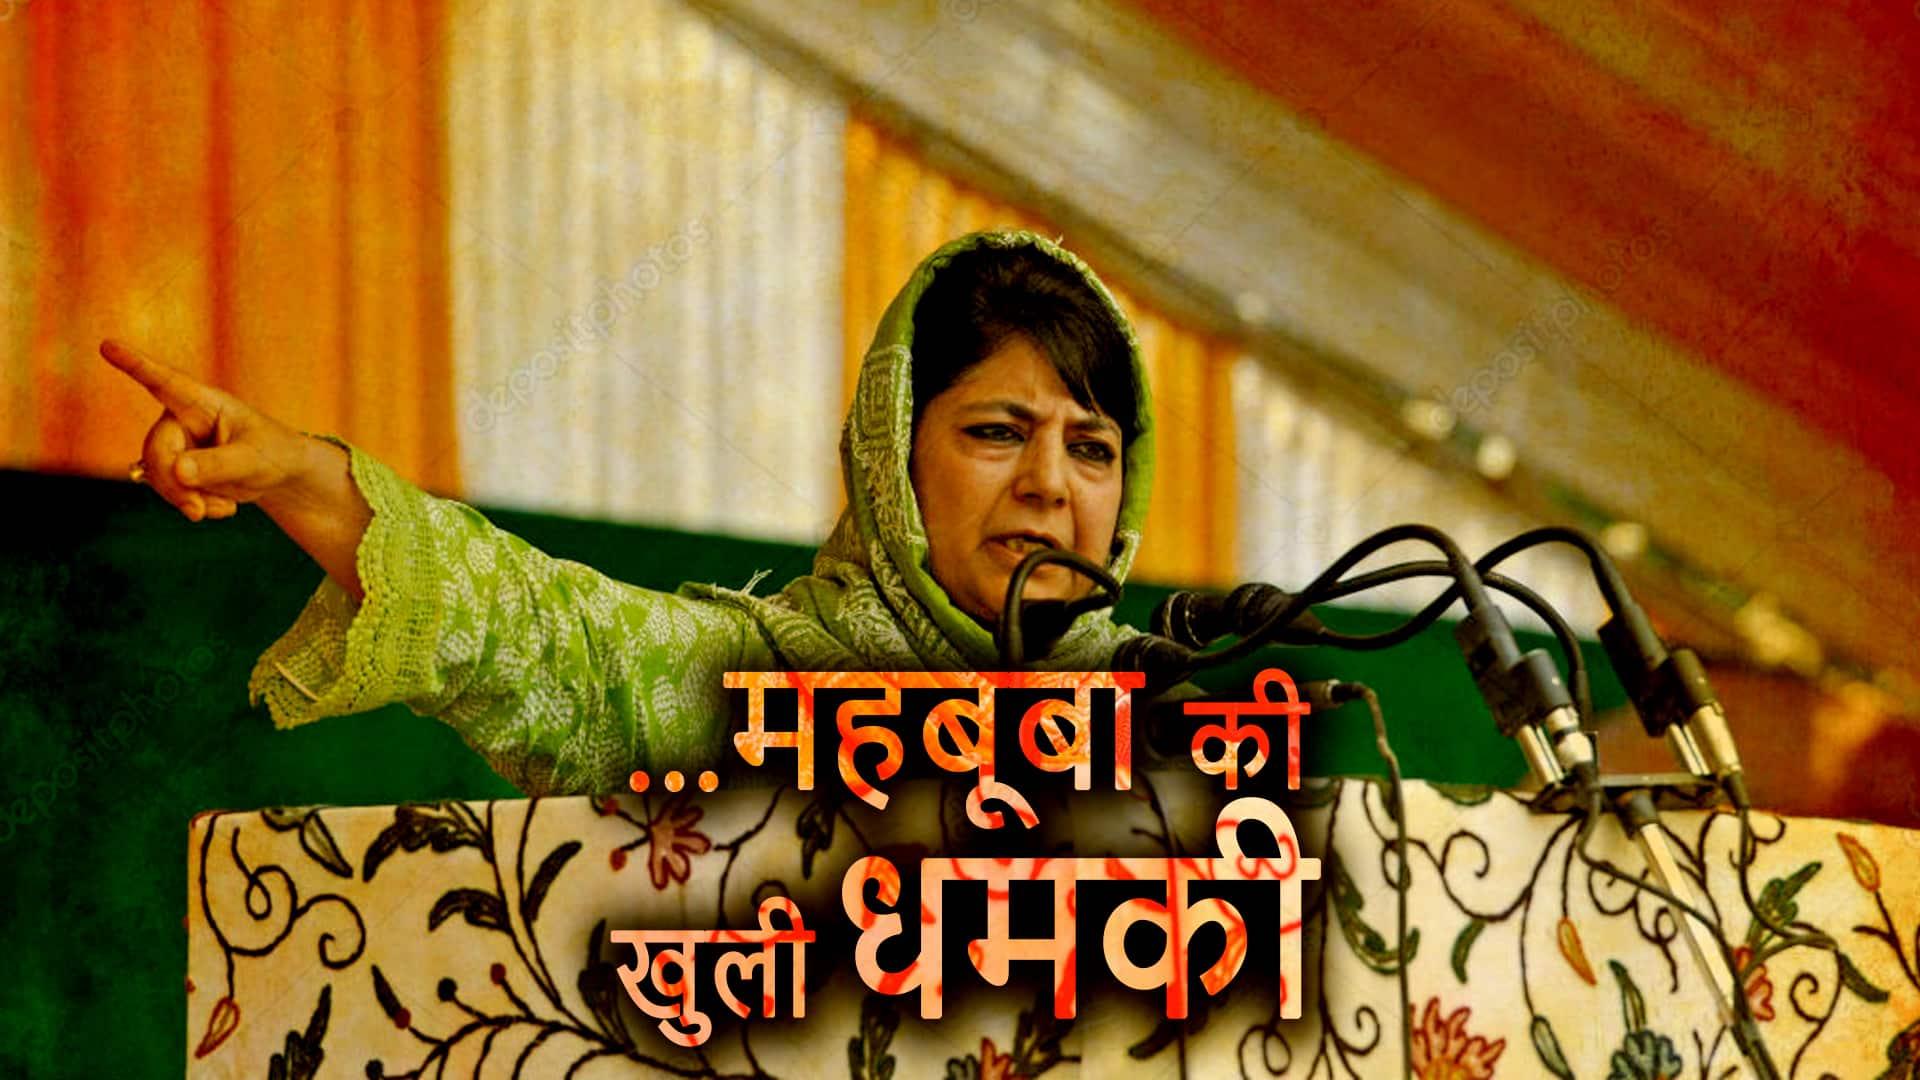 Mehbooba warns Delhi for breaking PDP